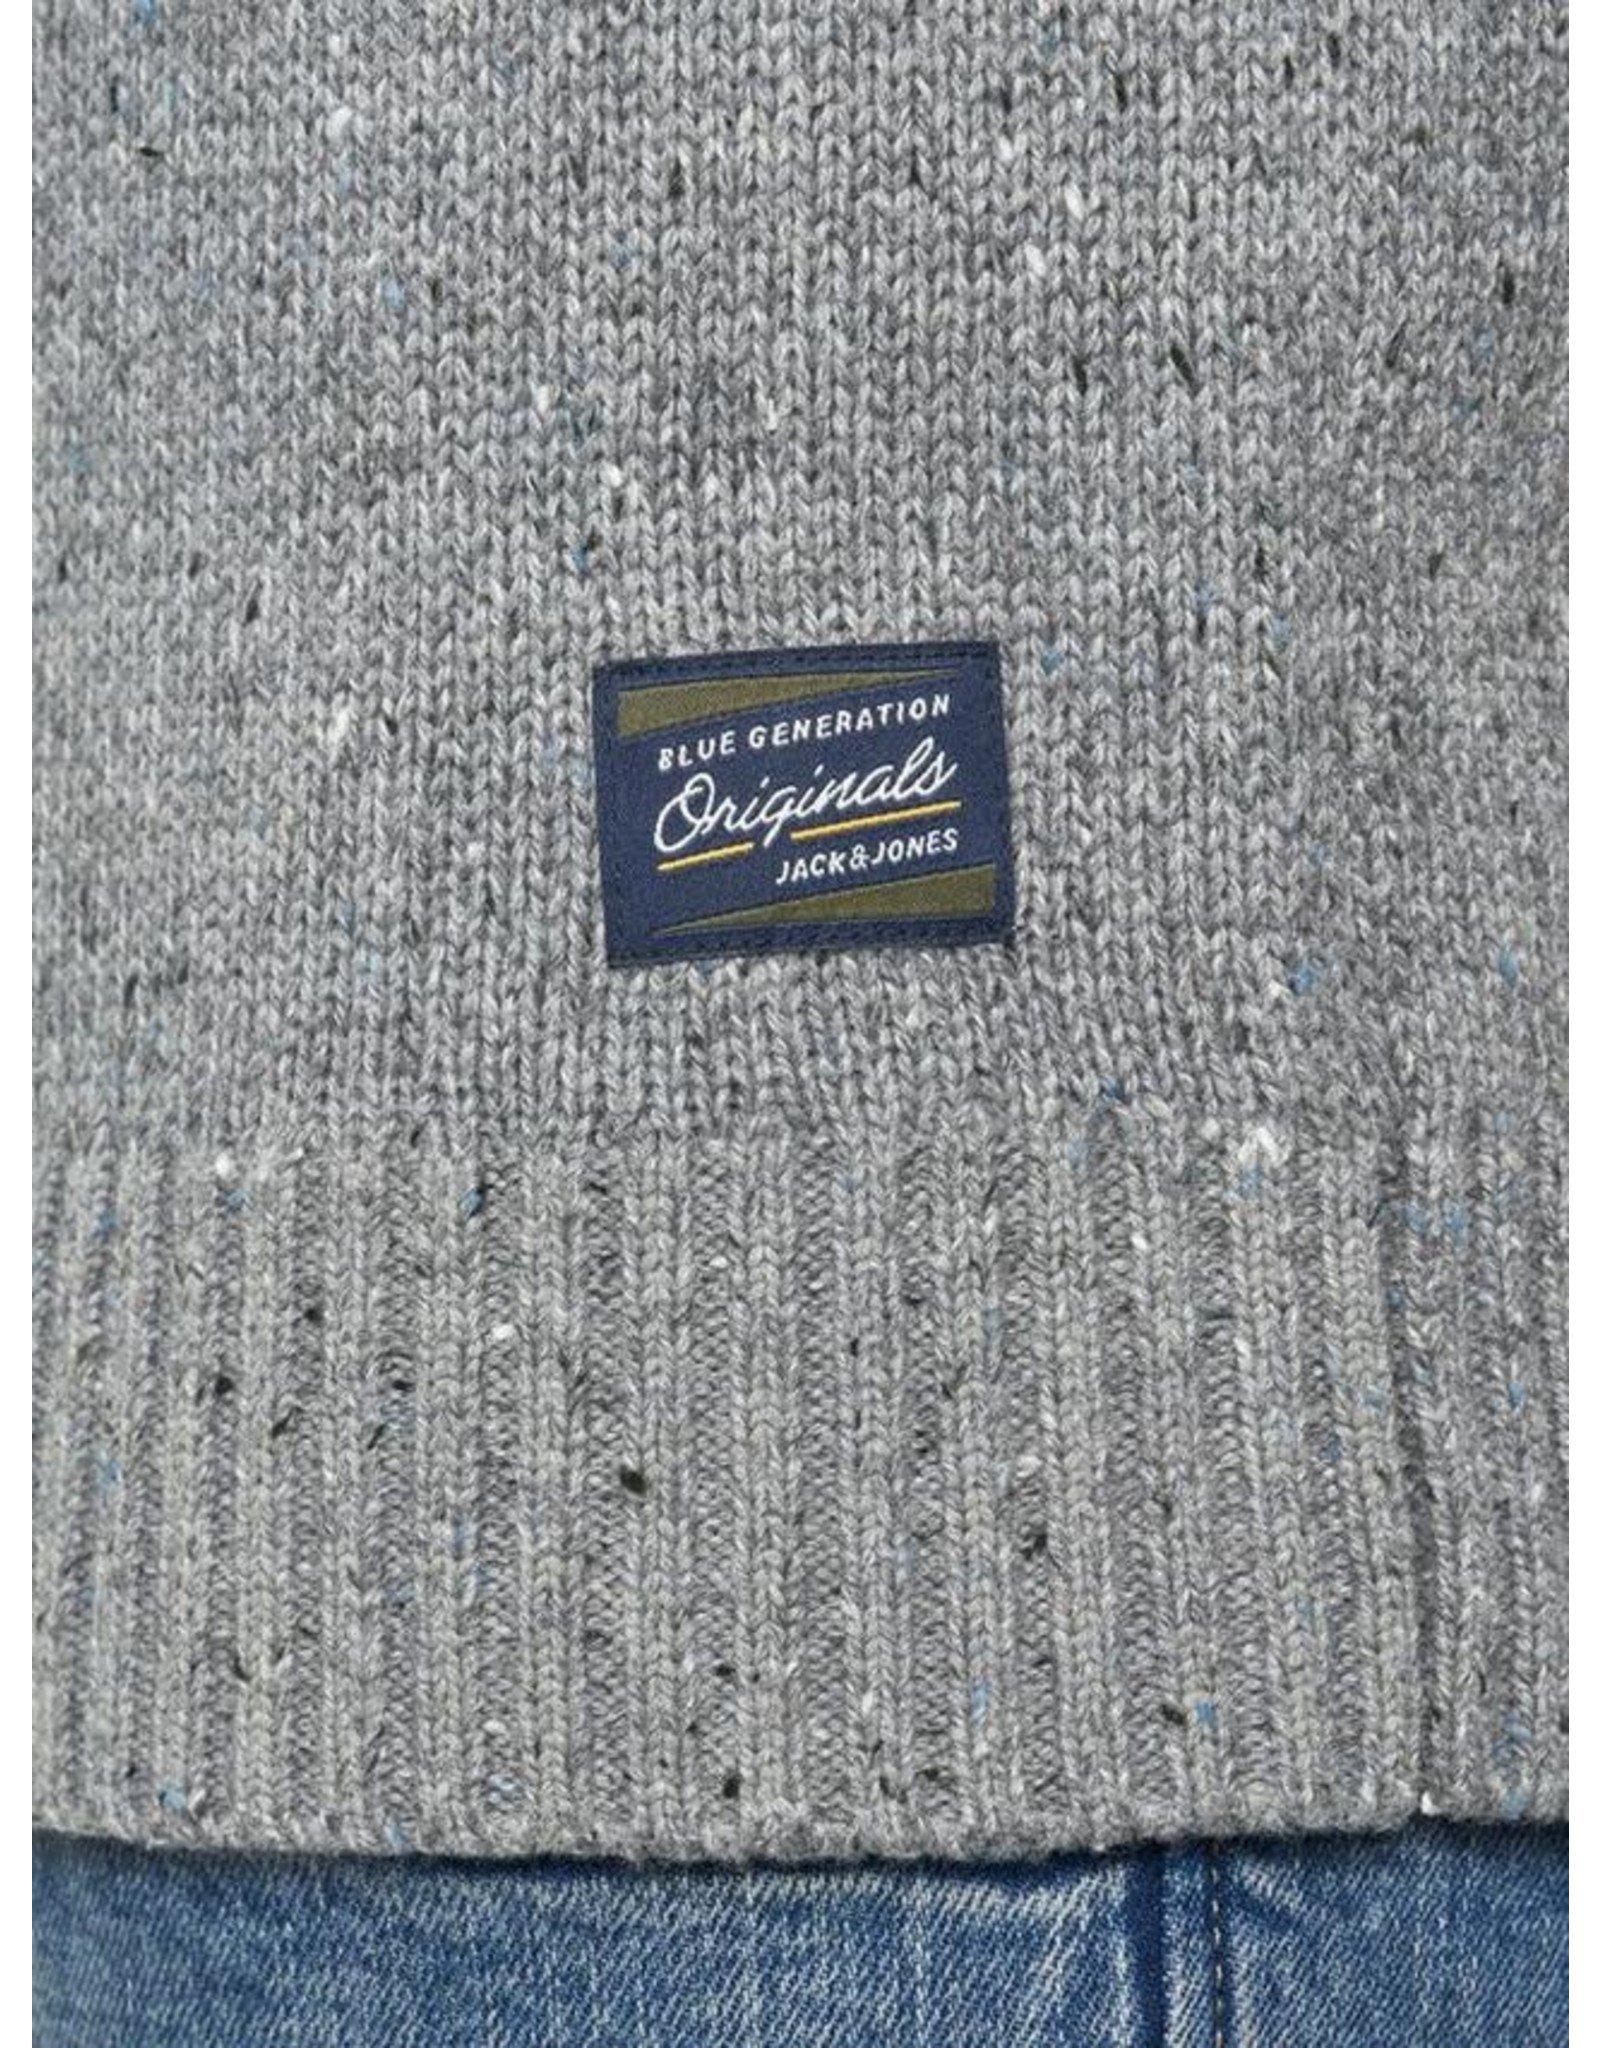 Jack & Jones Jack & Jones Jorjax Knit Crew Sweater - 2 Colors